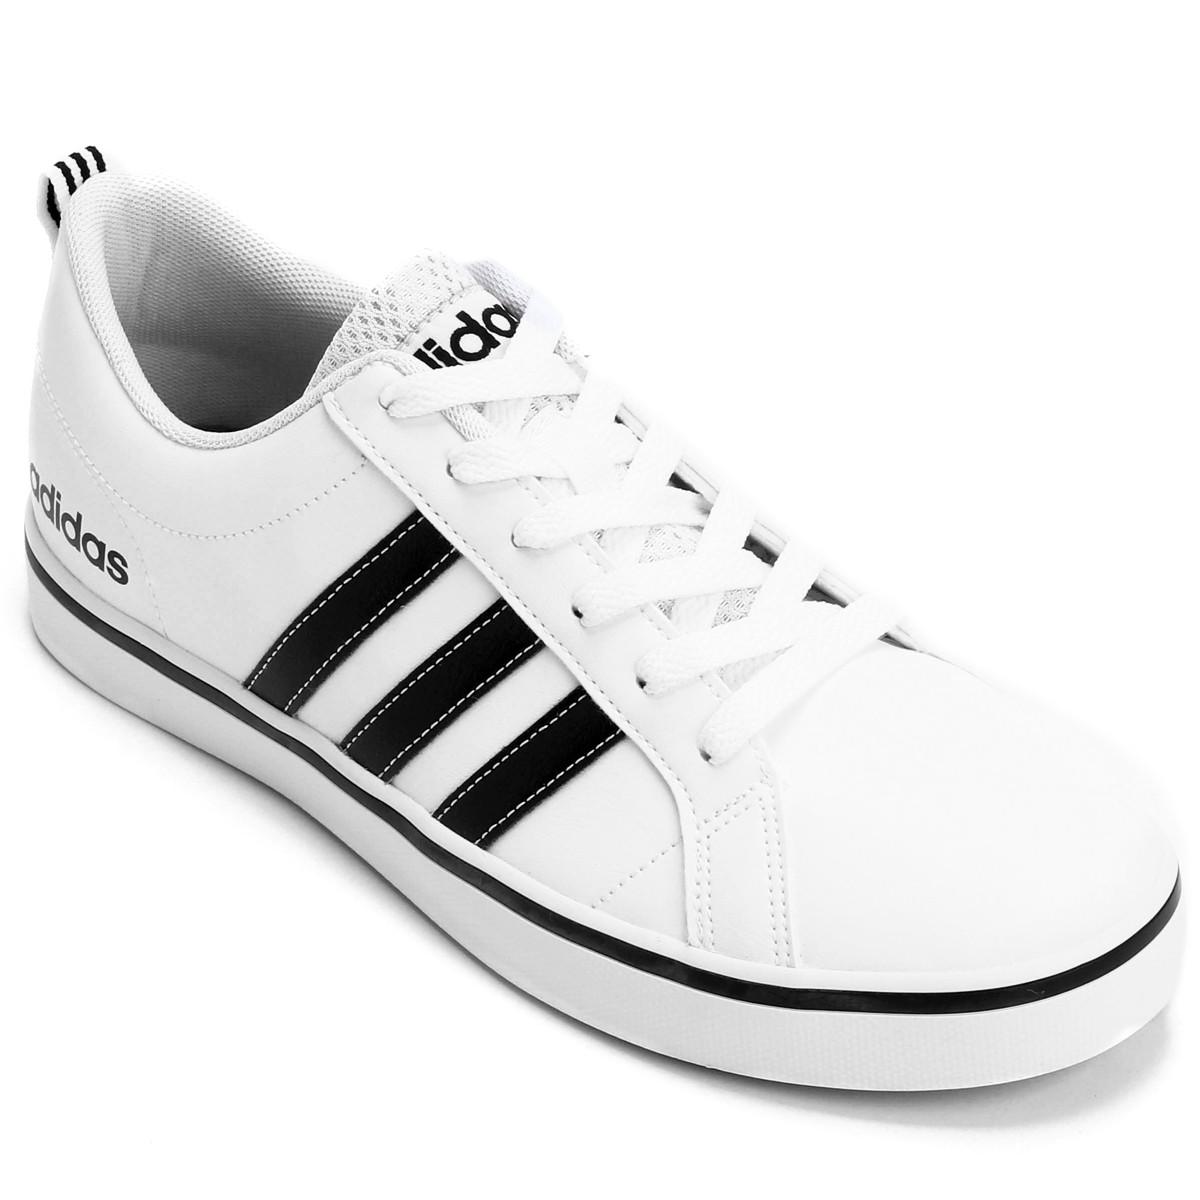 f7559c95d67d9 Tênis Masculino Adidas Pace Vs AW4594 Branco Preto